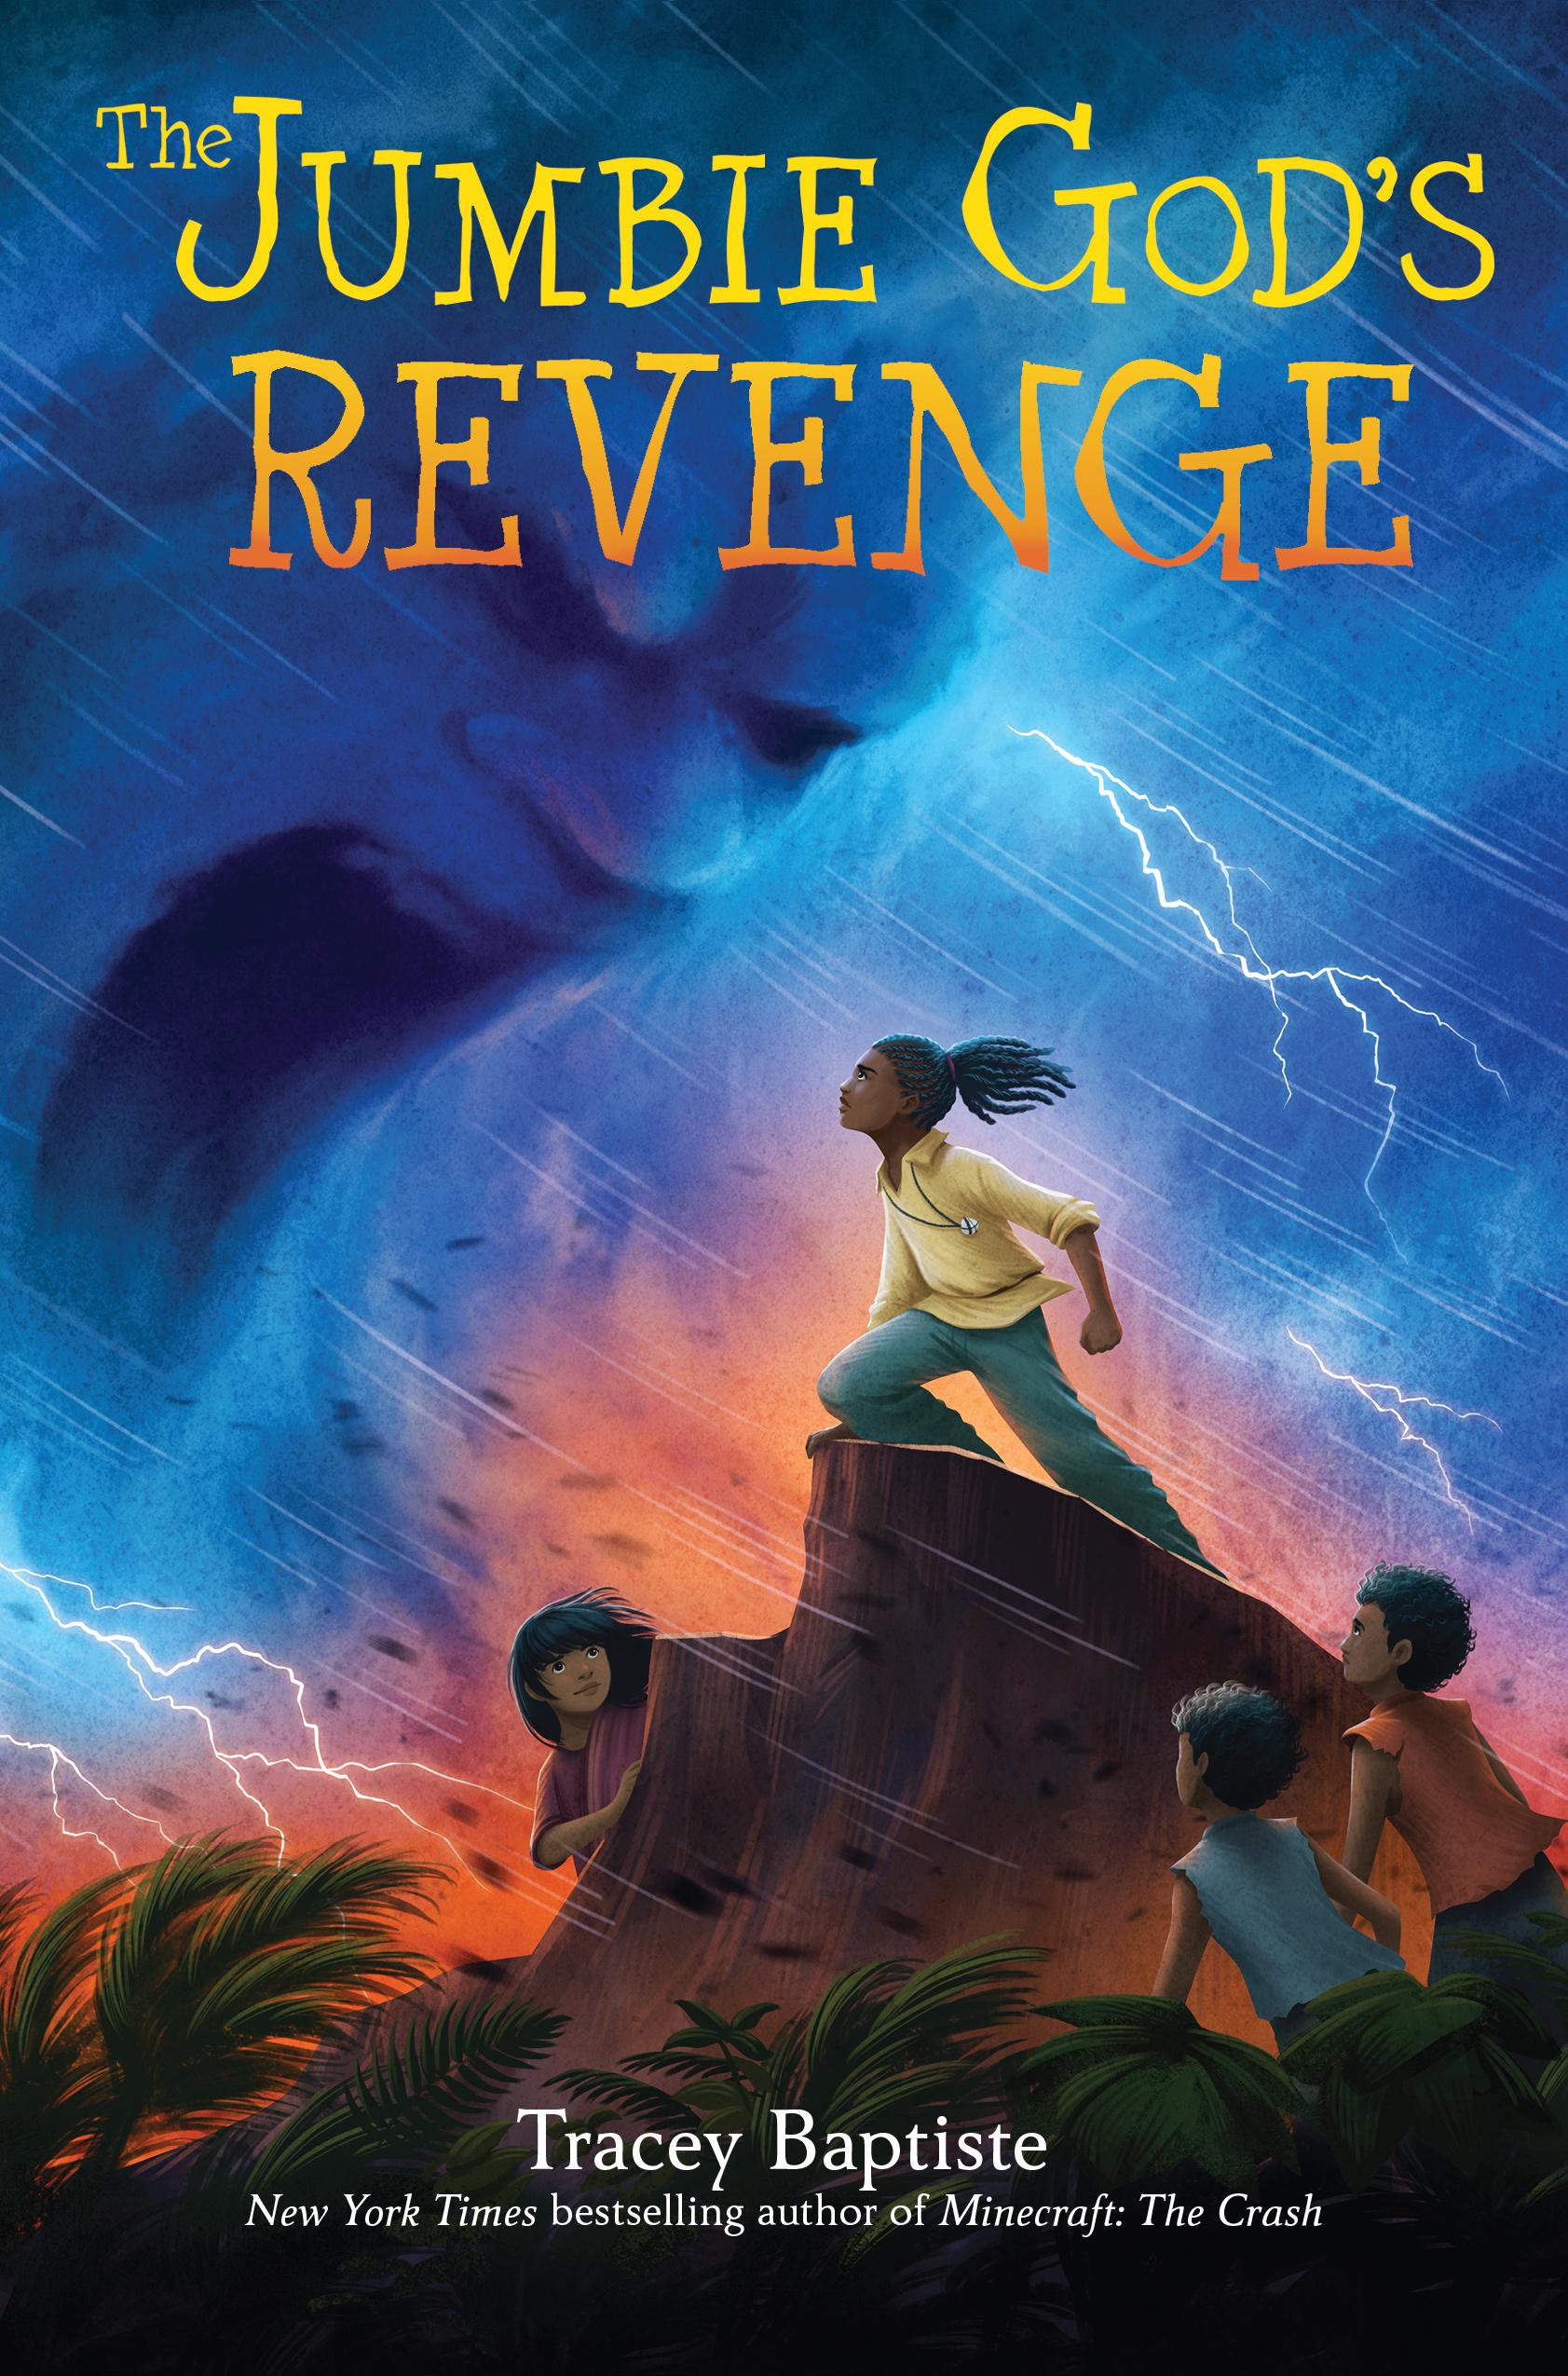 Blog Tour: The Jumbie God's Revenge by Tracey Baptiste (Excerpt!)